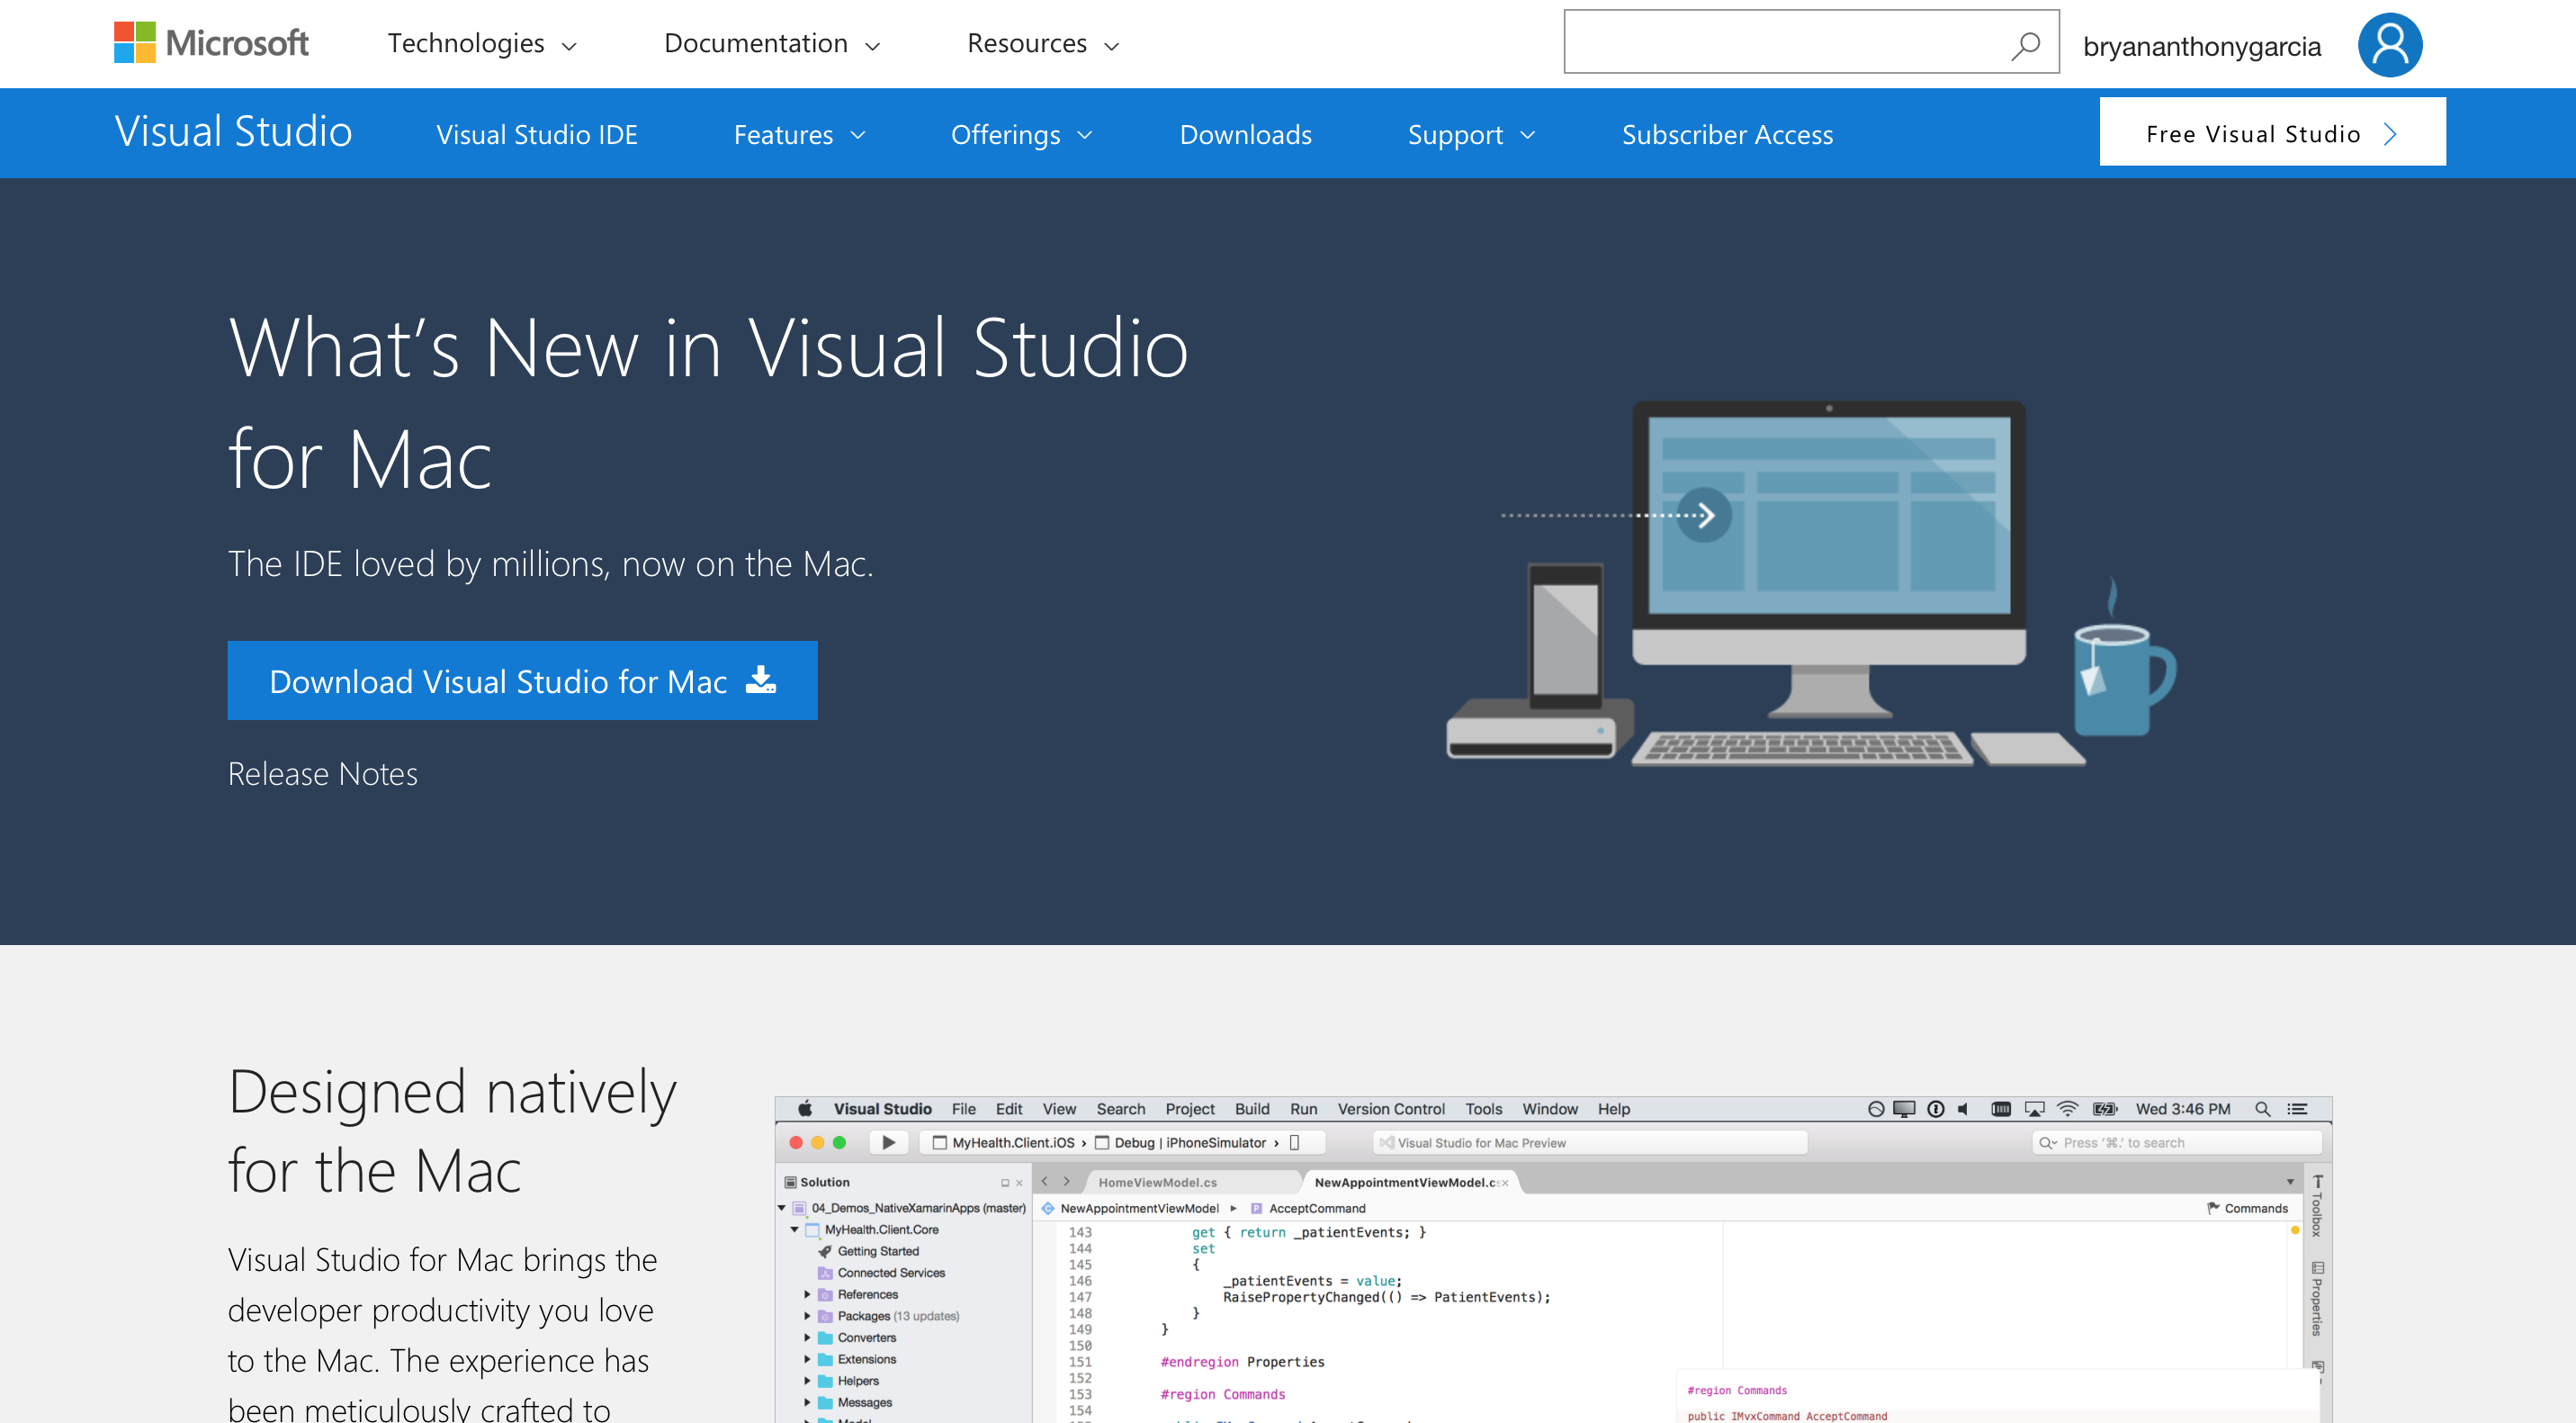 download visual studio for mac xamarin